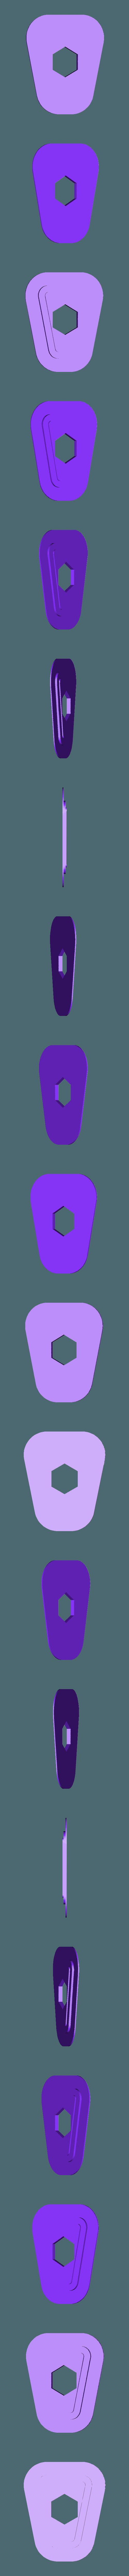 coilA.stl Download free STL file basic electric generator • 3D printable design, lukeskymuh